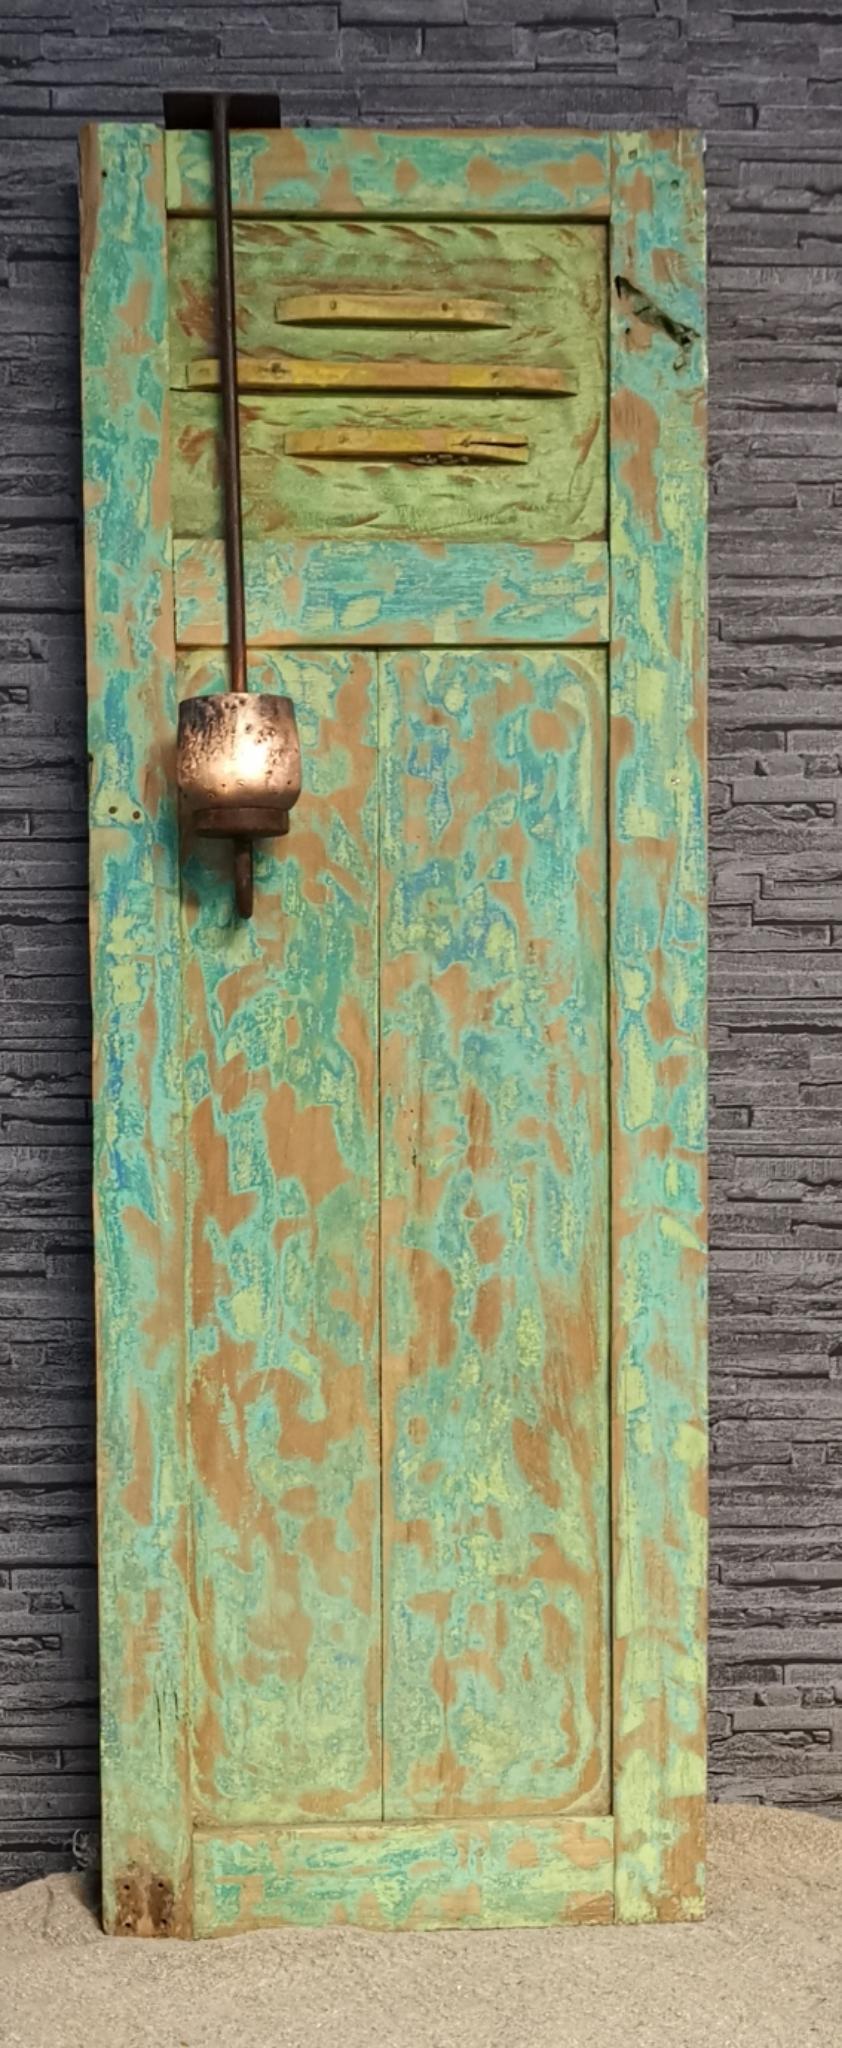 Oude houten deur #1 01745